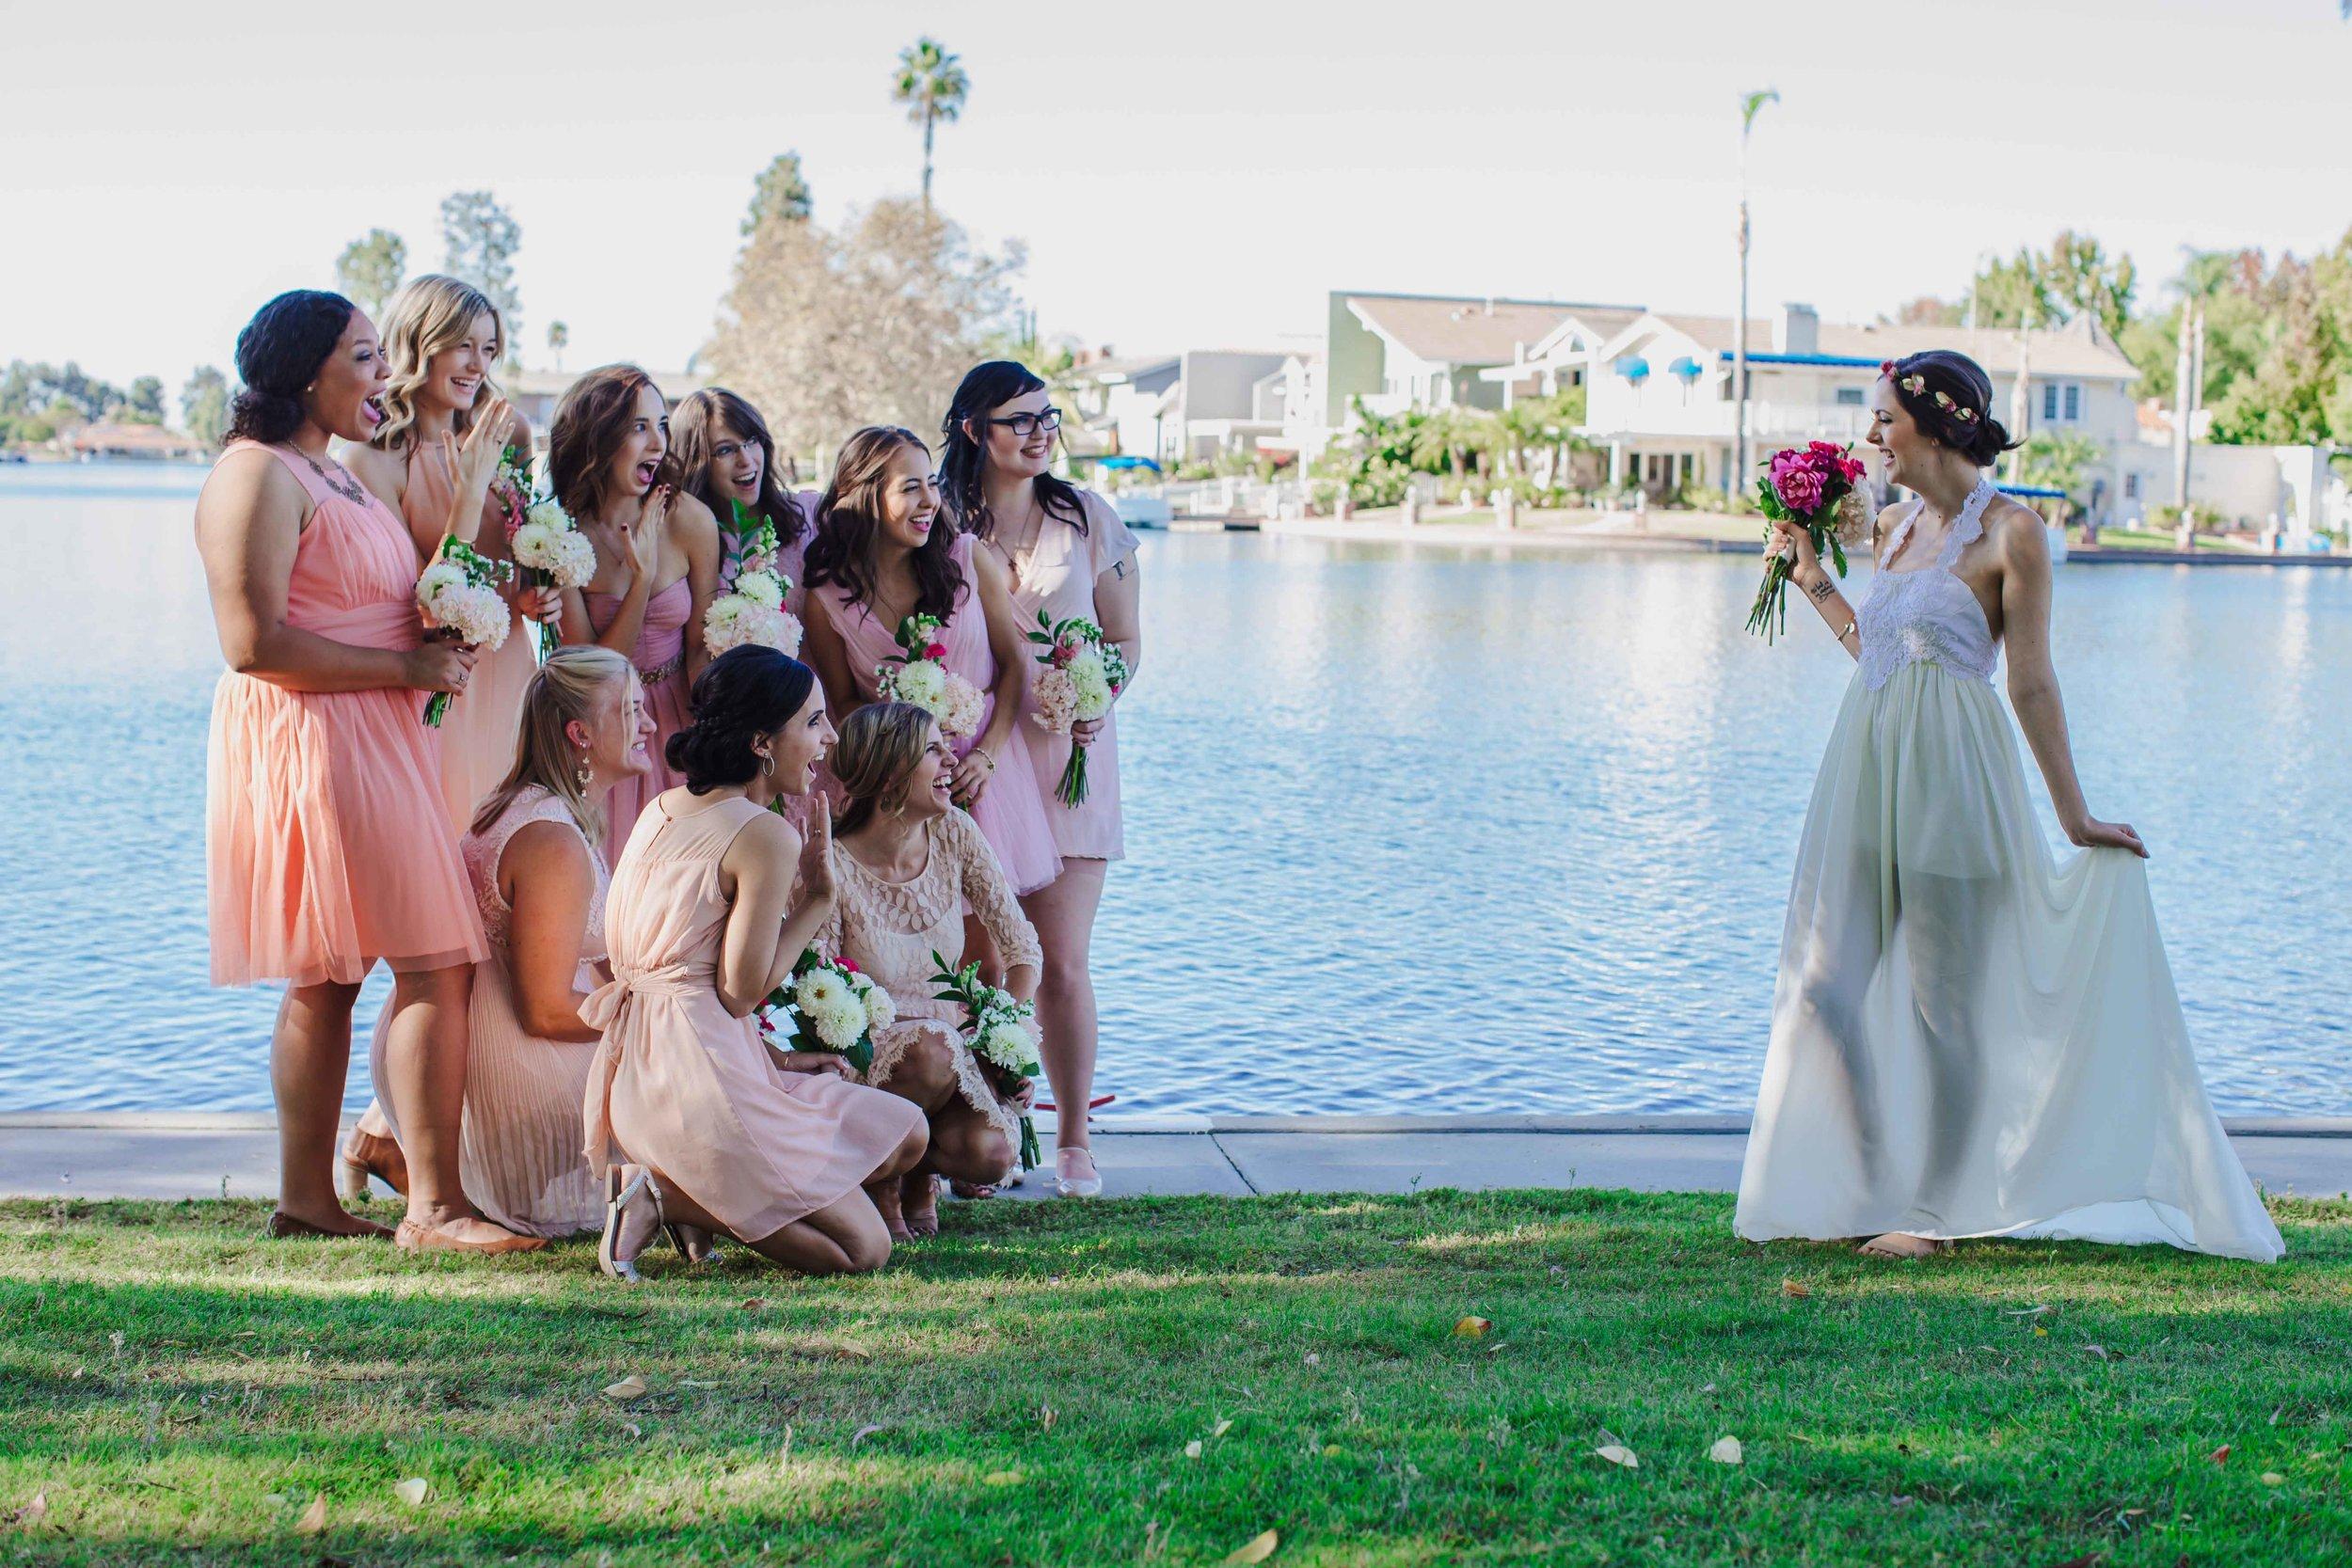 20141024-DePartee-Wedding-APavone-021-sm.jpg